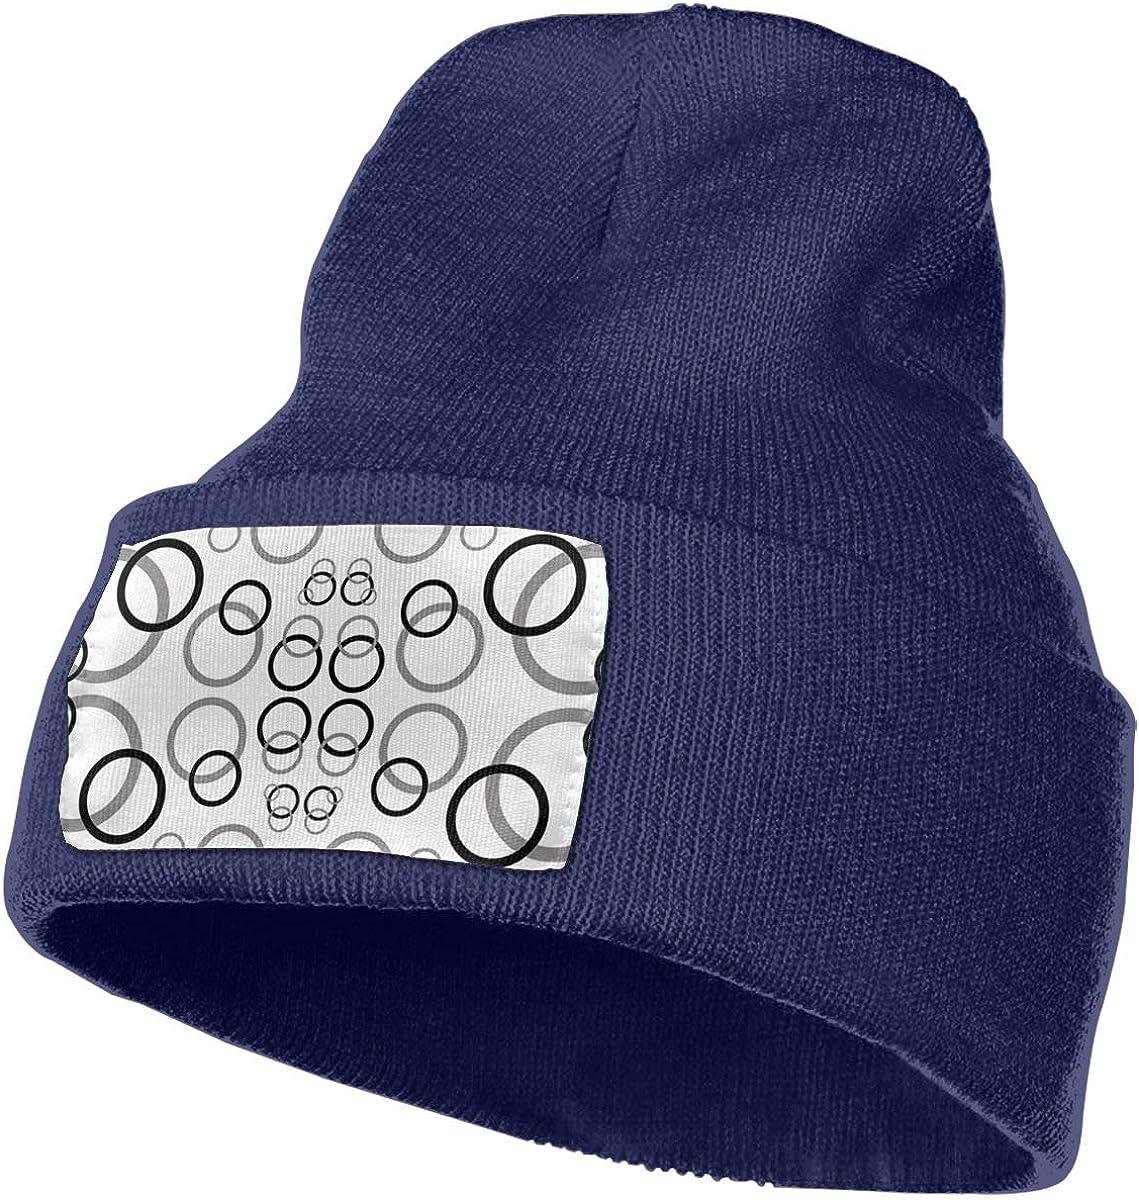 ONHIM Black Grey Circles Men /& Women Winter Warm Knit Beanie Hat Slouchy Rollup Hats